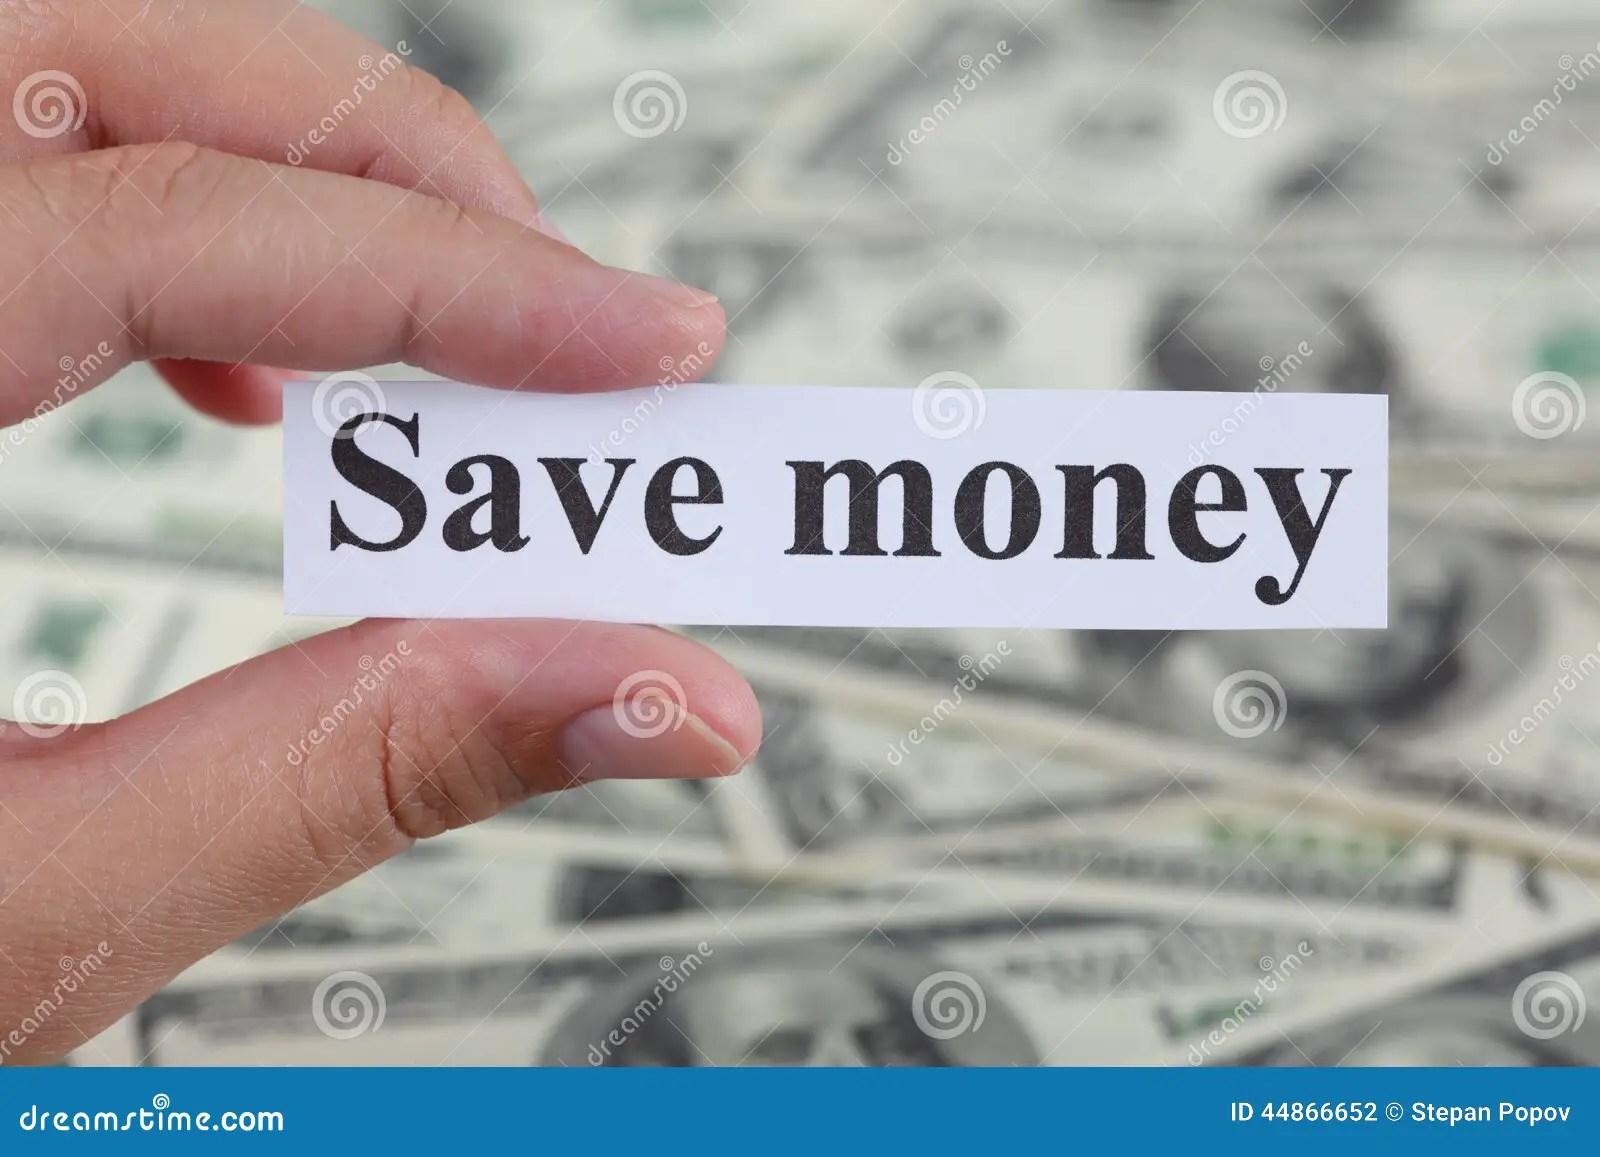 Save Money Stock Photo  Image 44866652